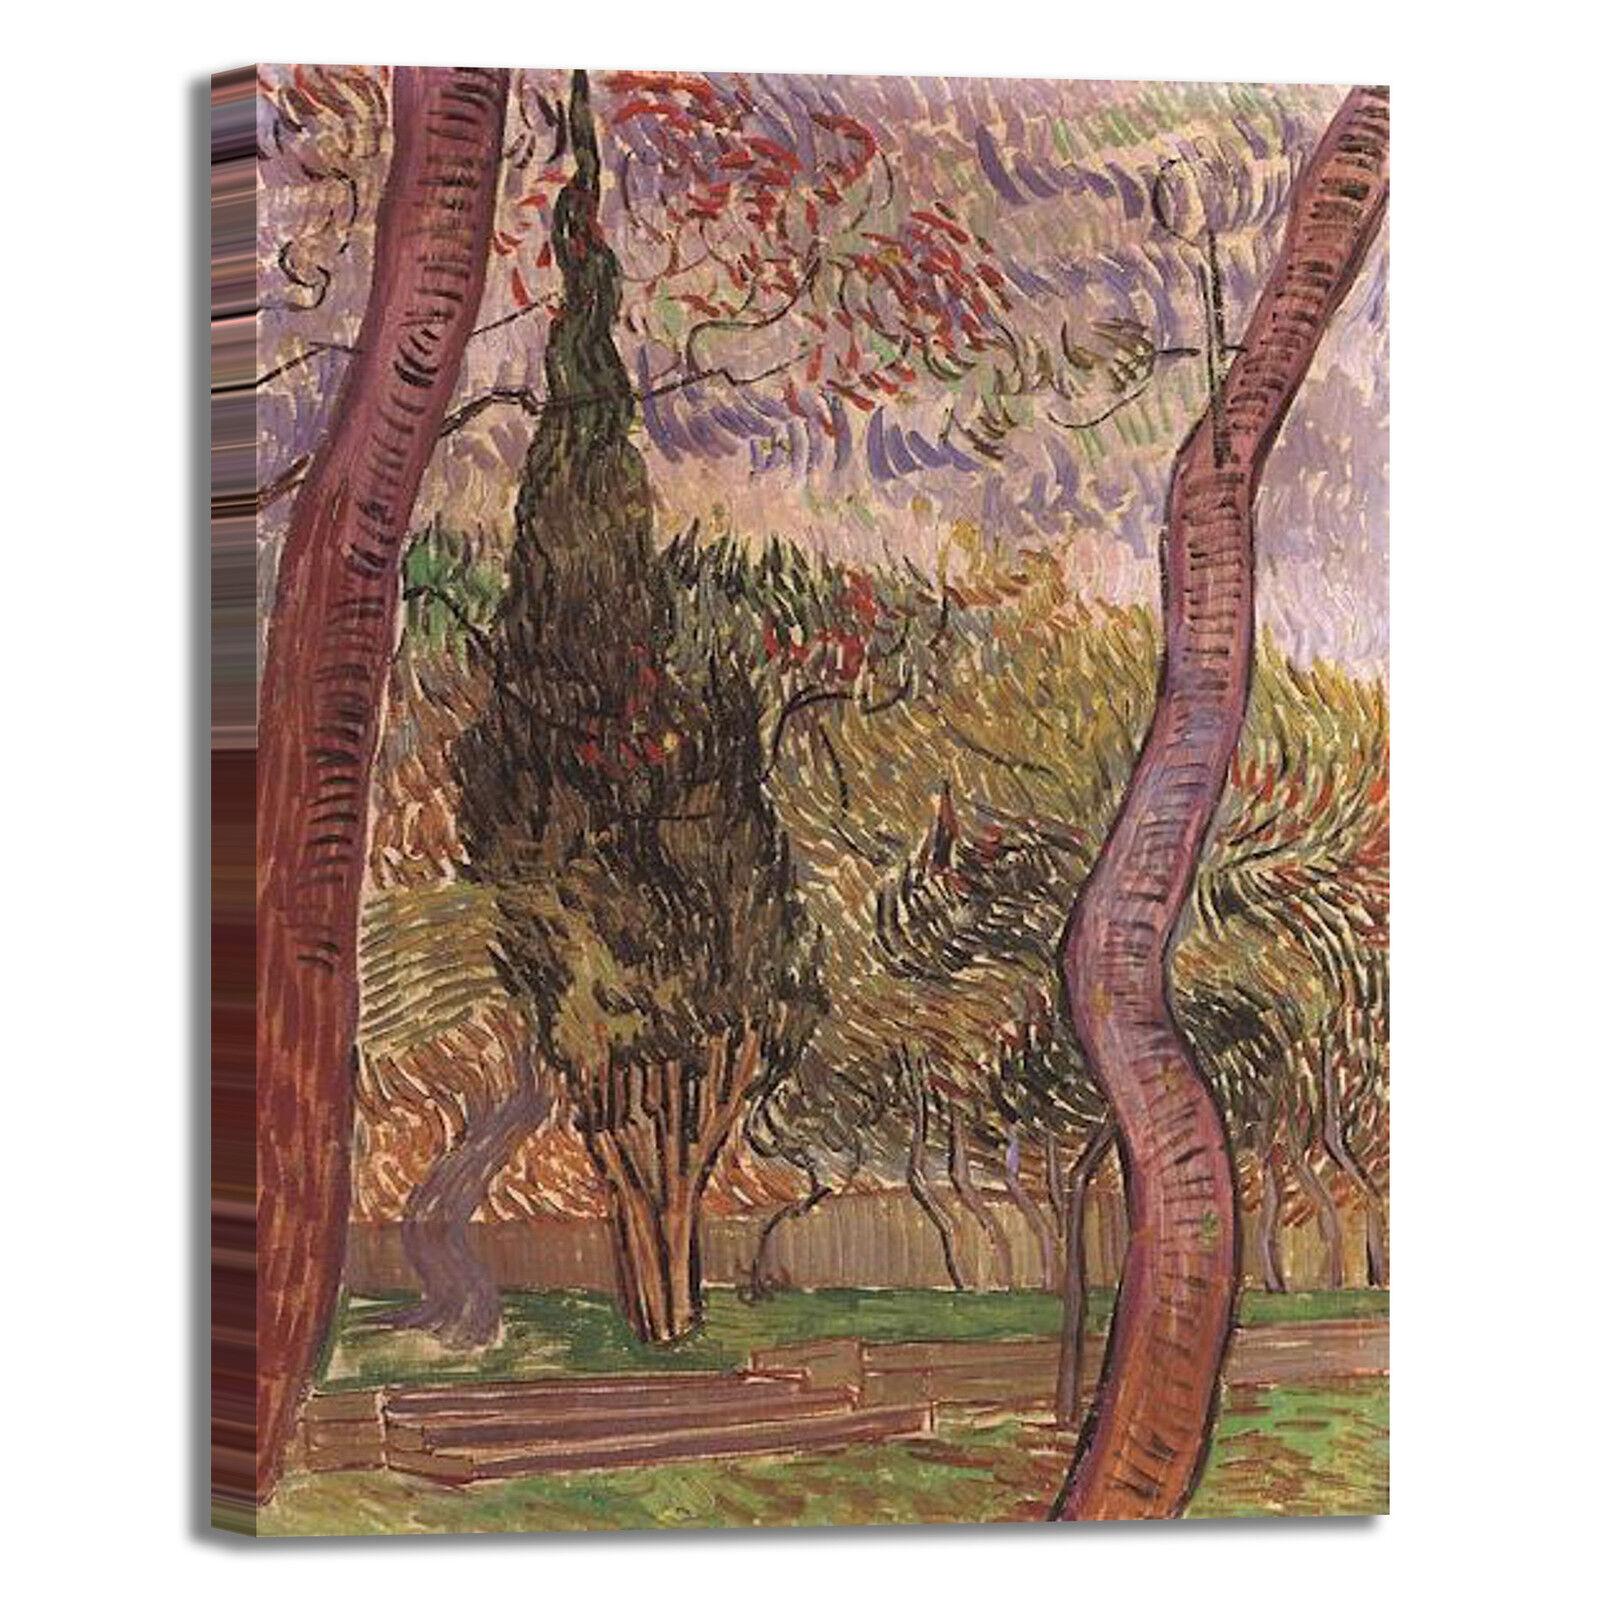 Van Gogh il giardino di Saint Paul quadro stampa stampa stampa tela dipinto telaio arRouge o casa 7645fc